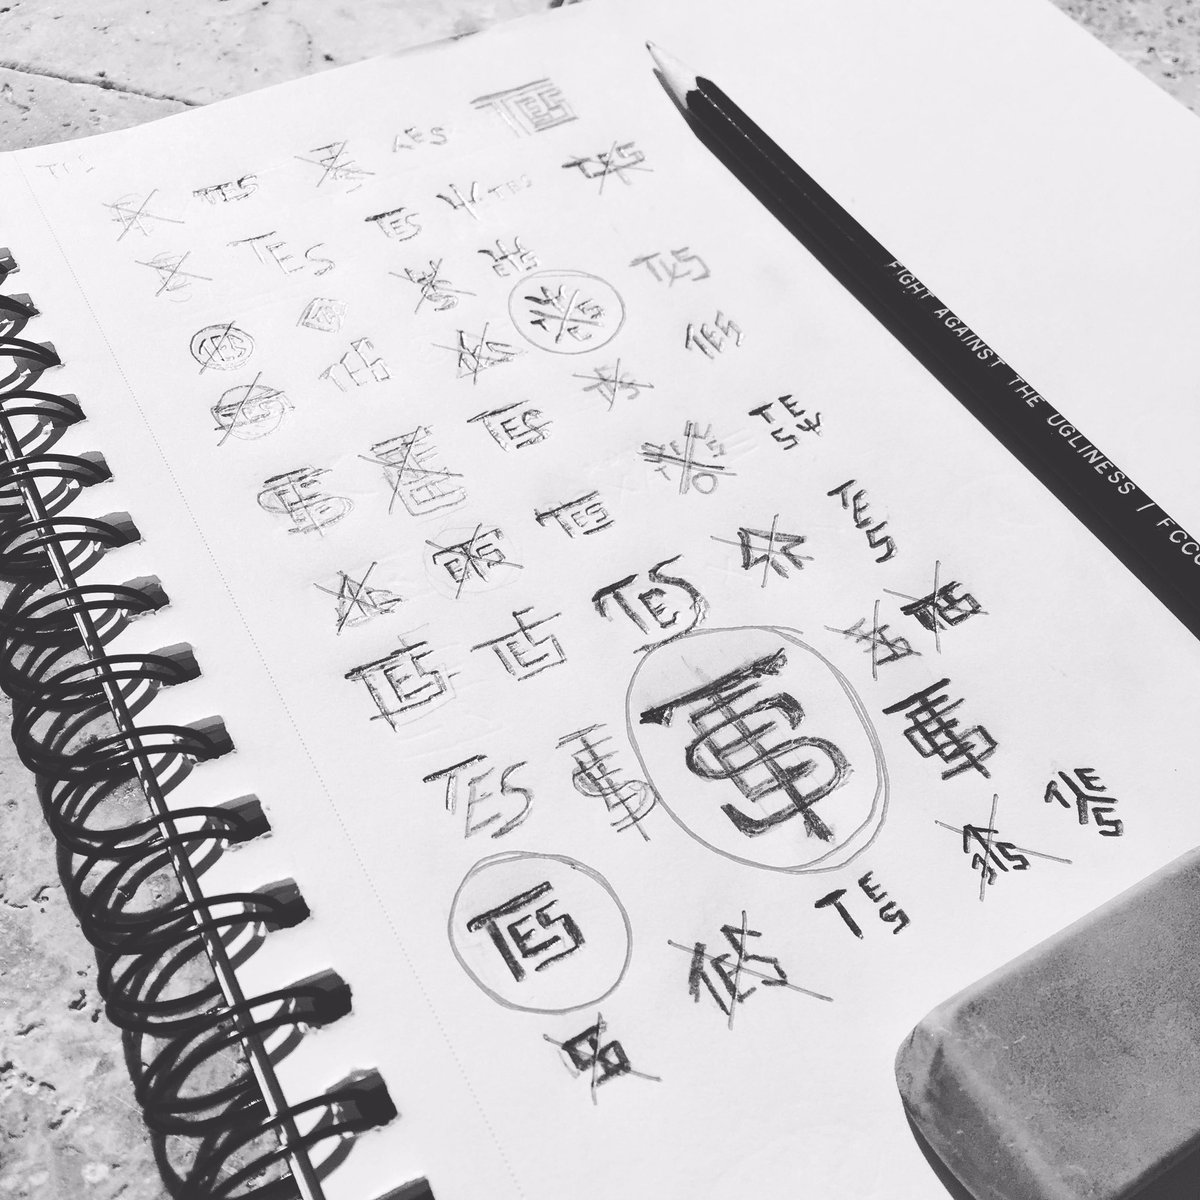 Nothing better than the tactile feel of pencil hitting paper.   #Monogram #Design #Designer #Logo #Logos #LogoDesign #Sketch #Sketches #Draw #Drawing #Pencil #LeapToCreate